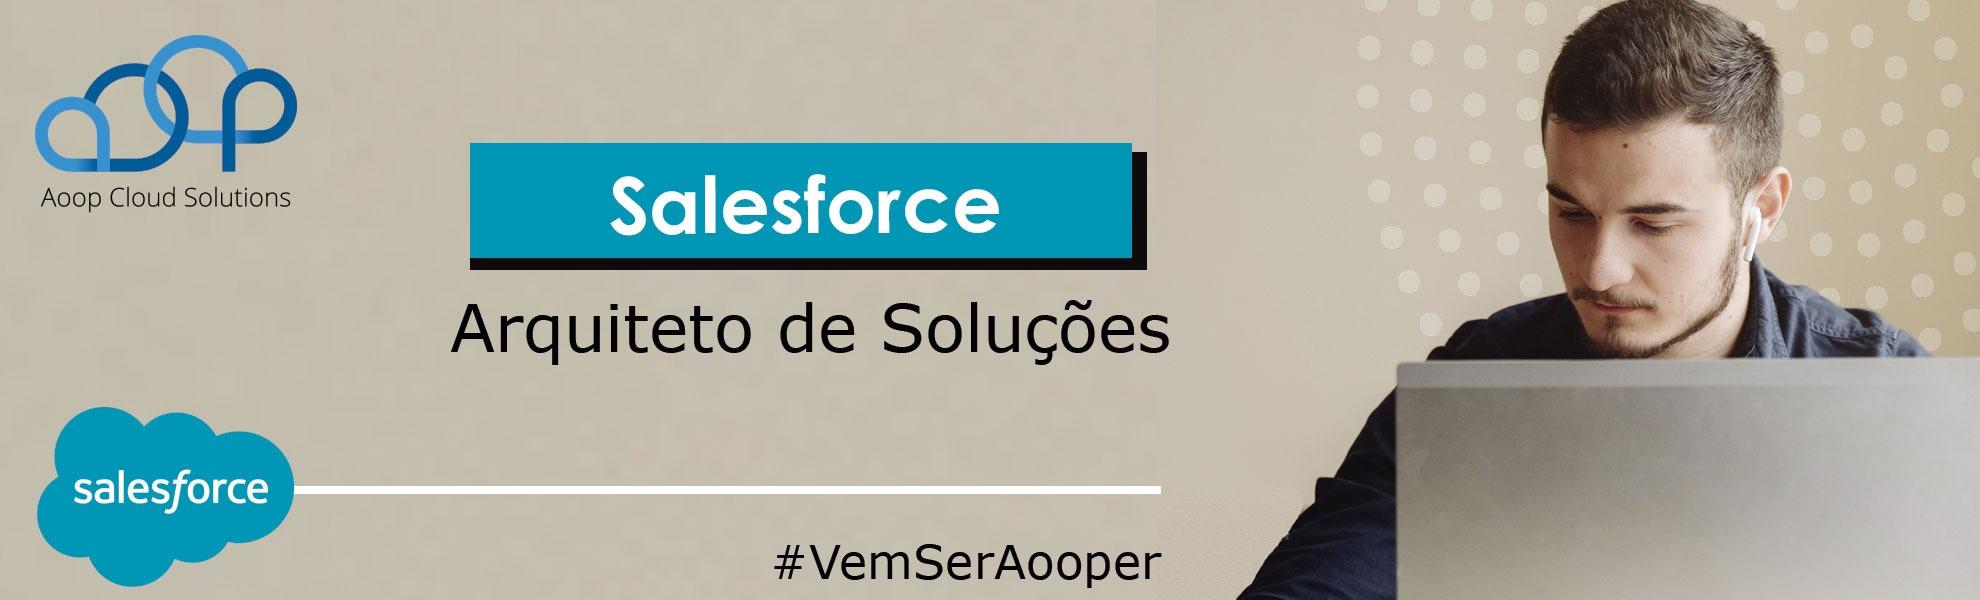 Arquiteto de Soluções - Salesforce